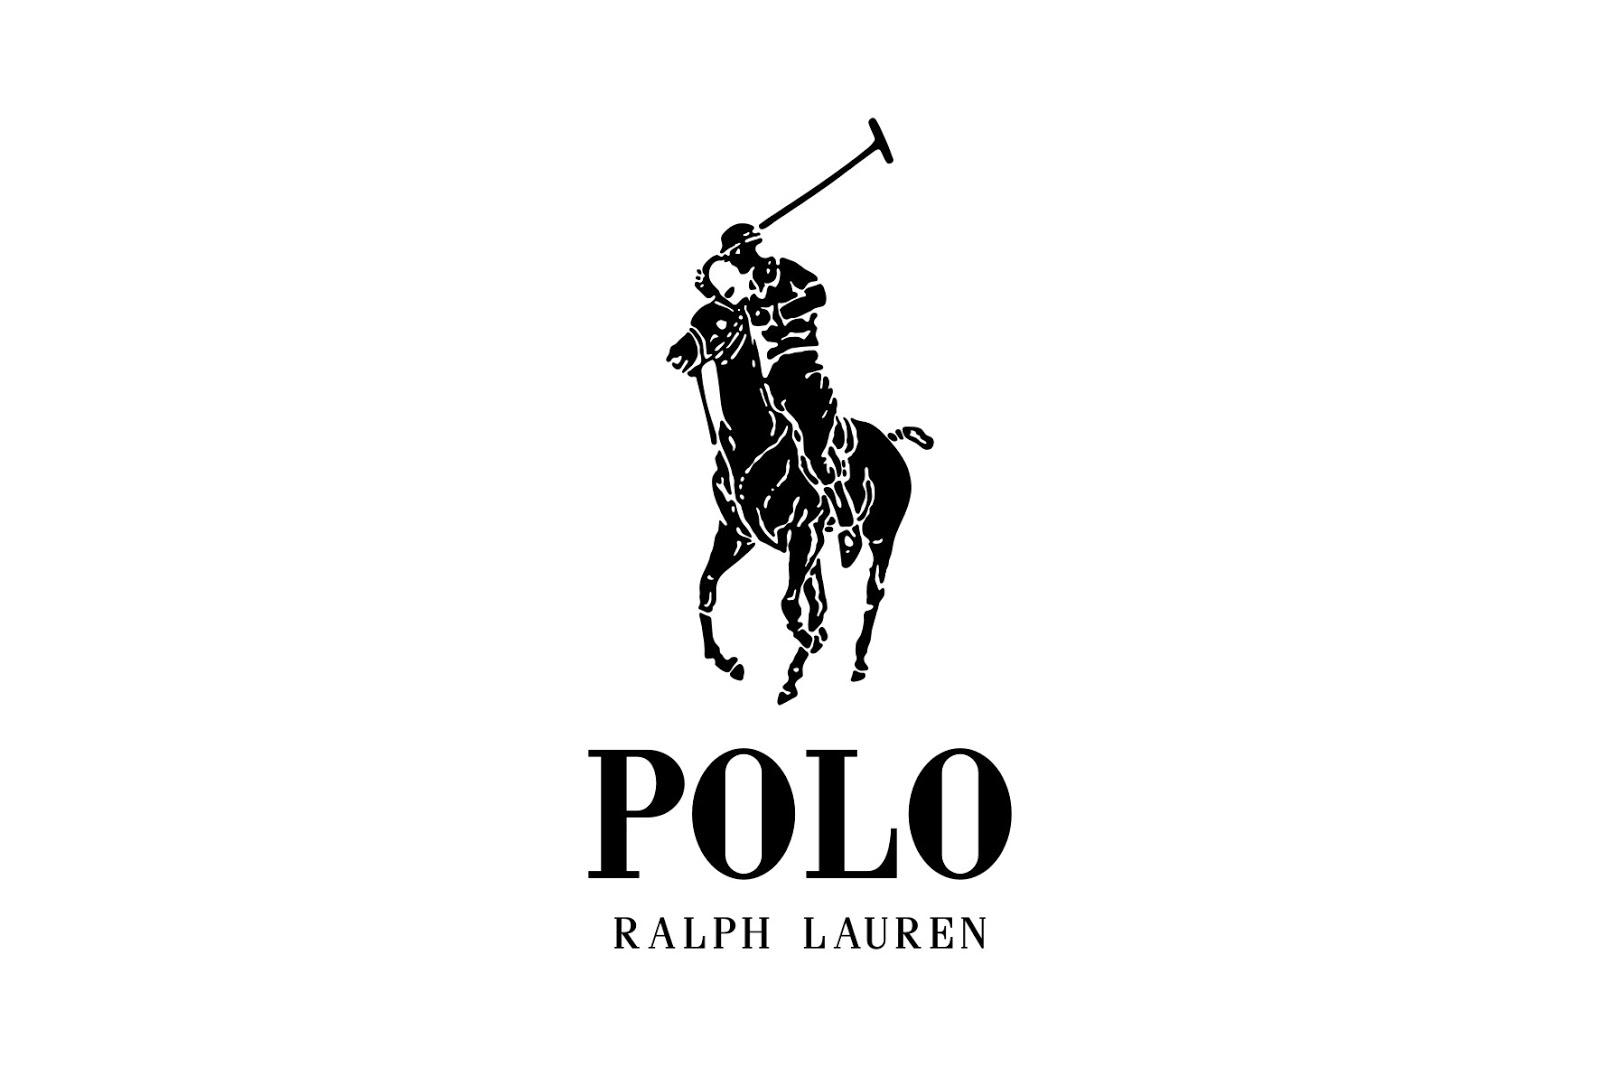 Polo - Ralph Lauren Logo